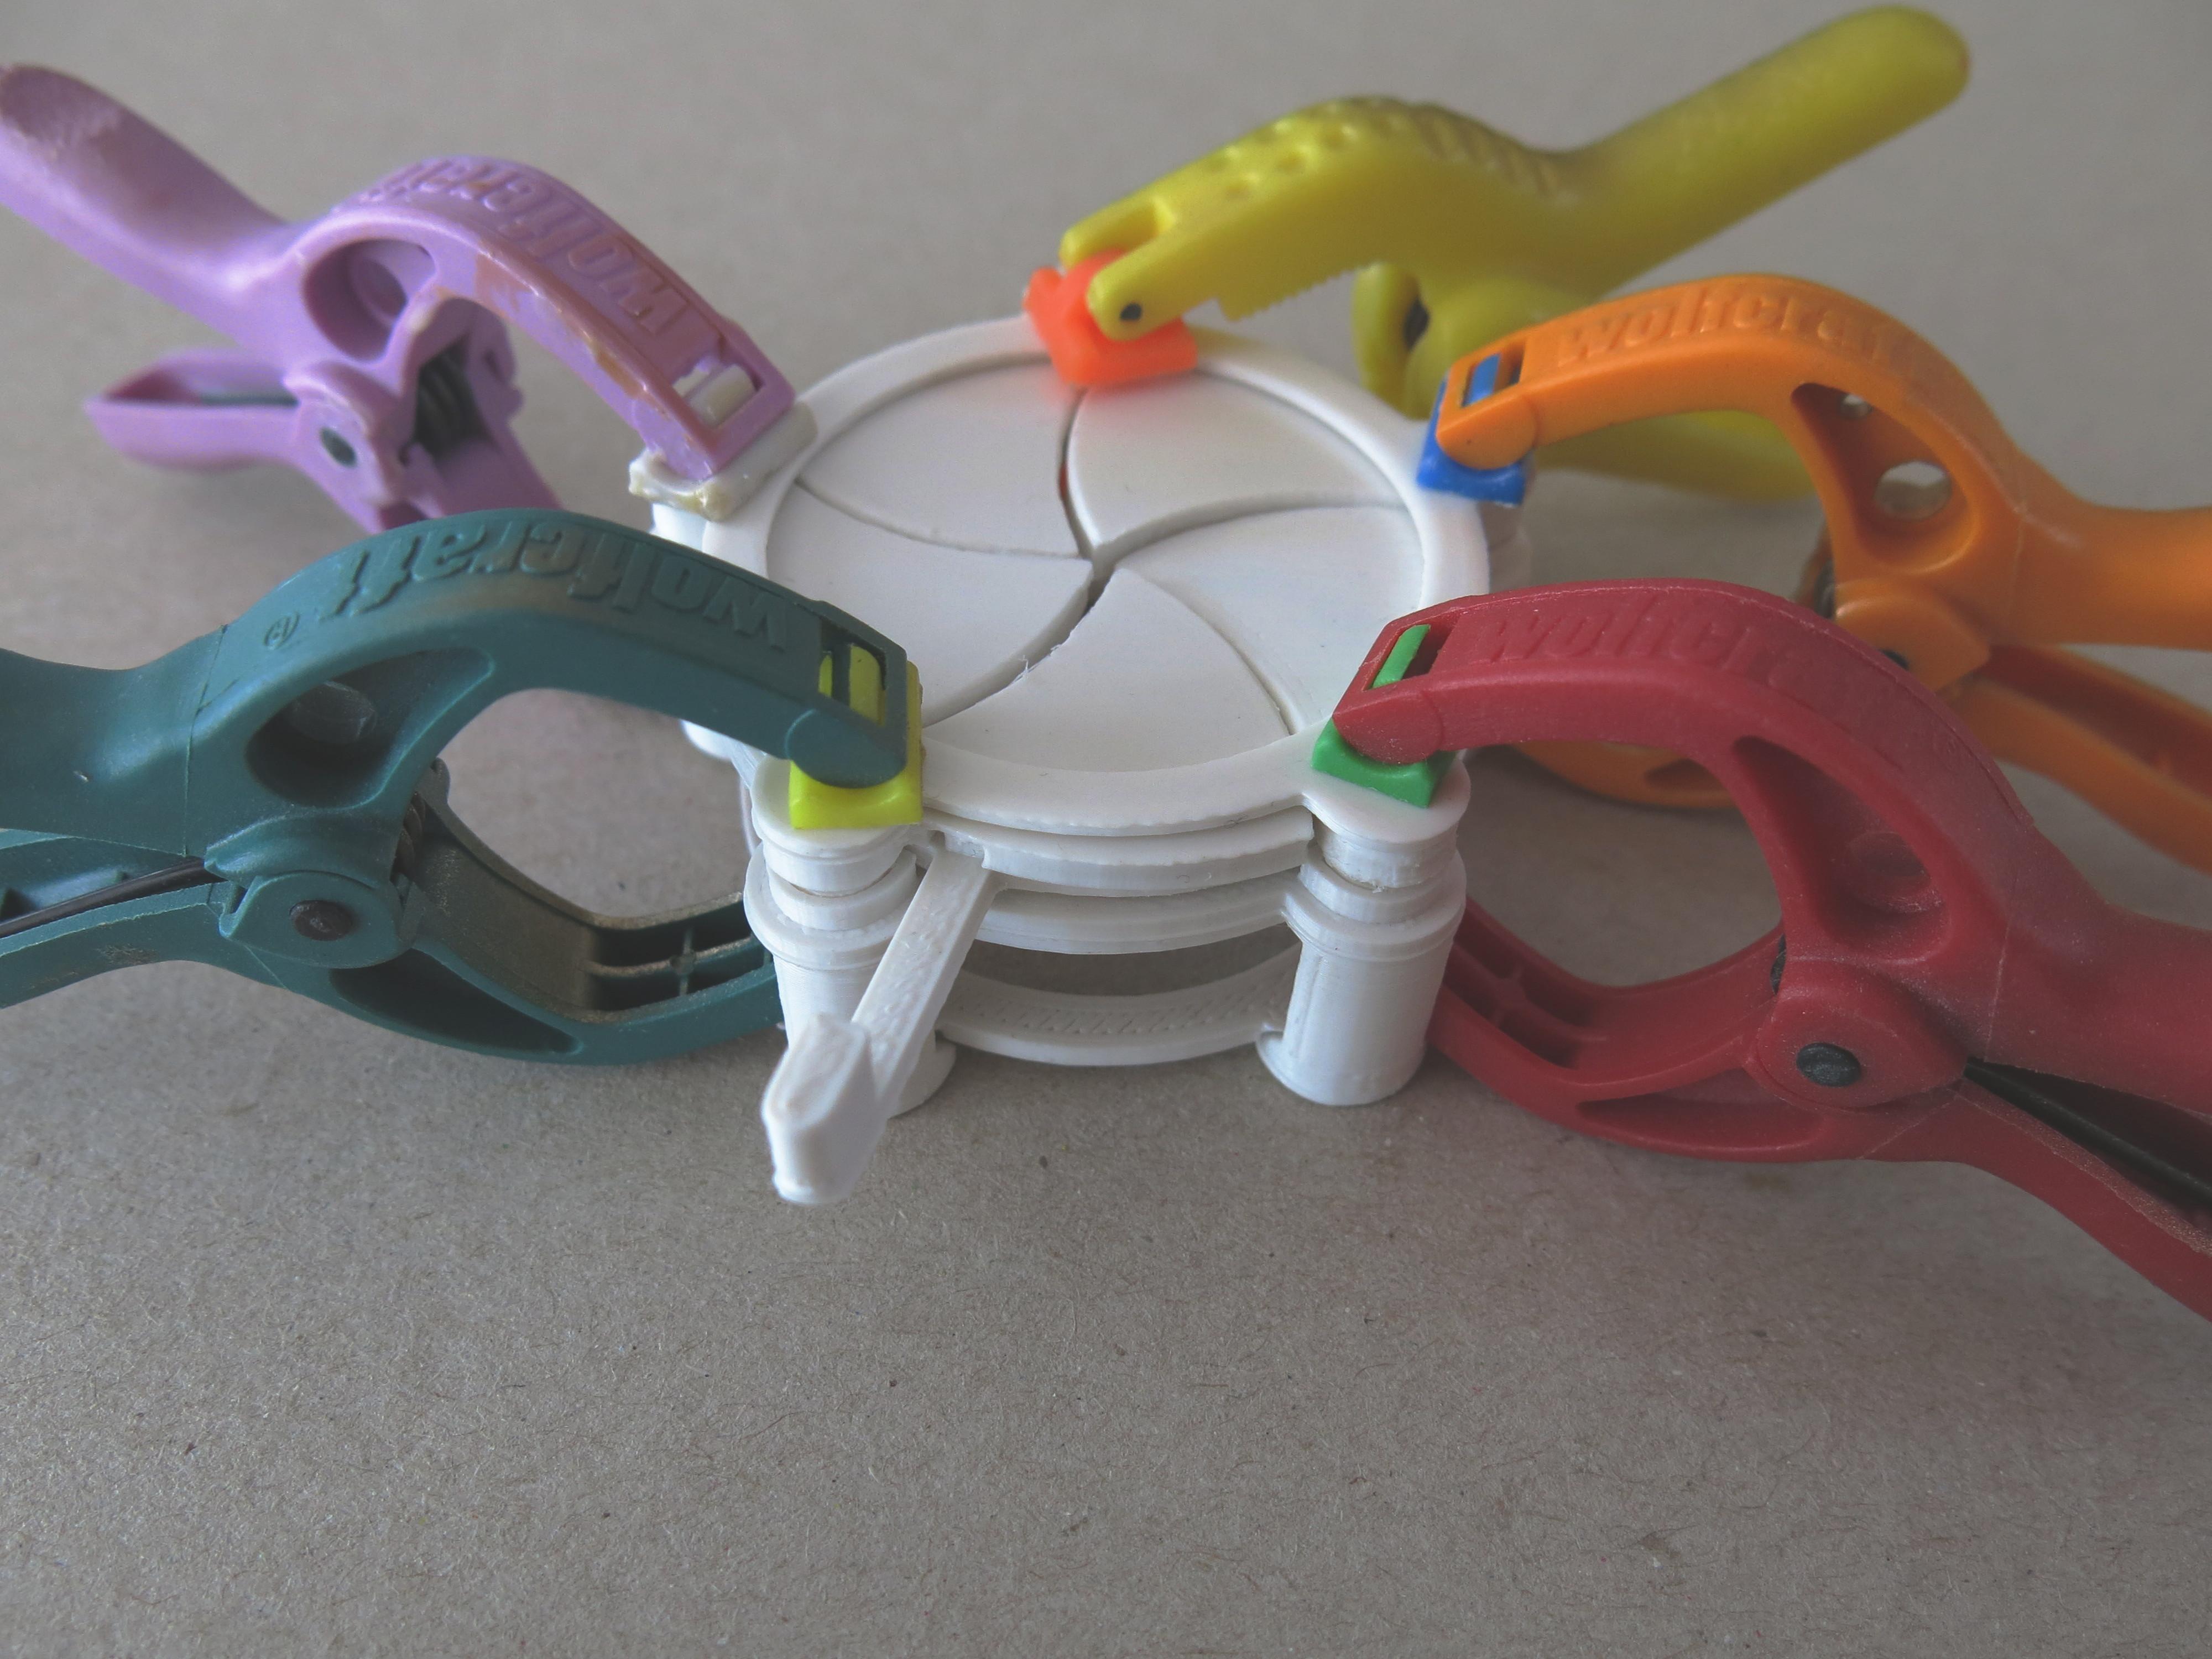 Picture of Optional - Attachment Design